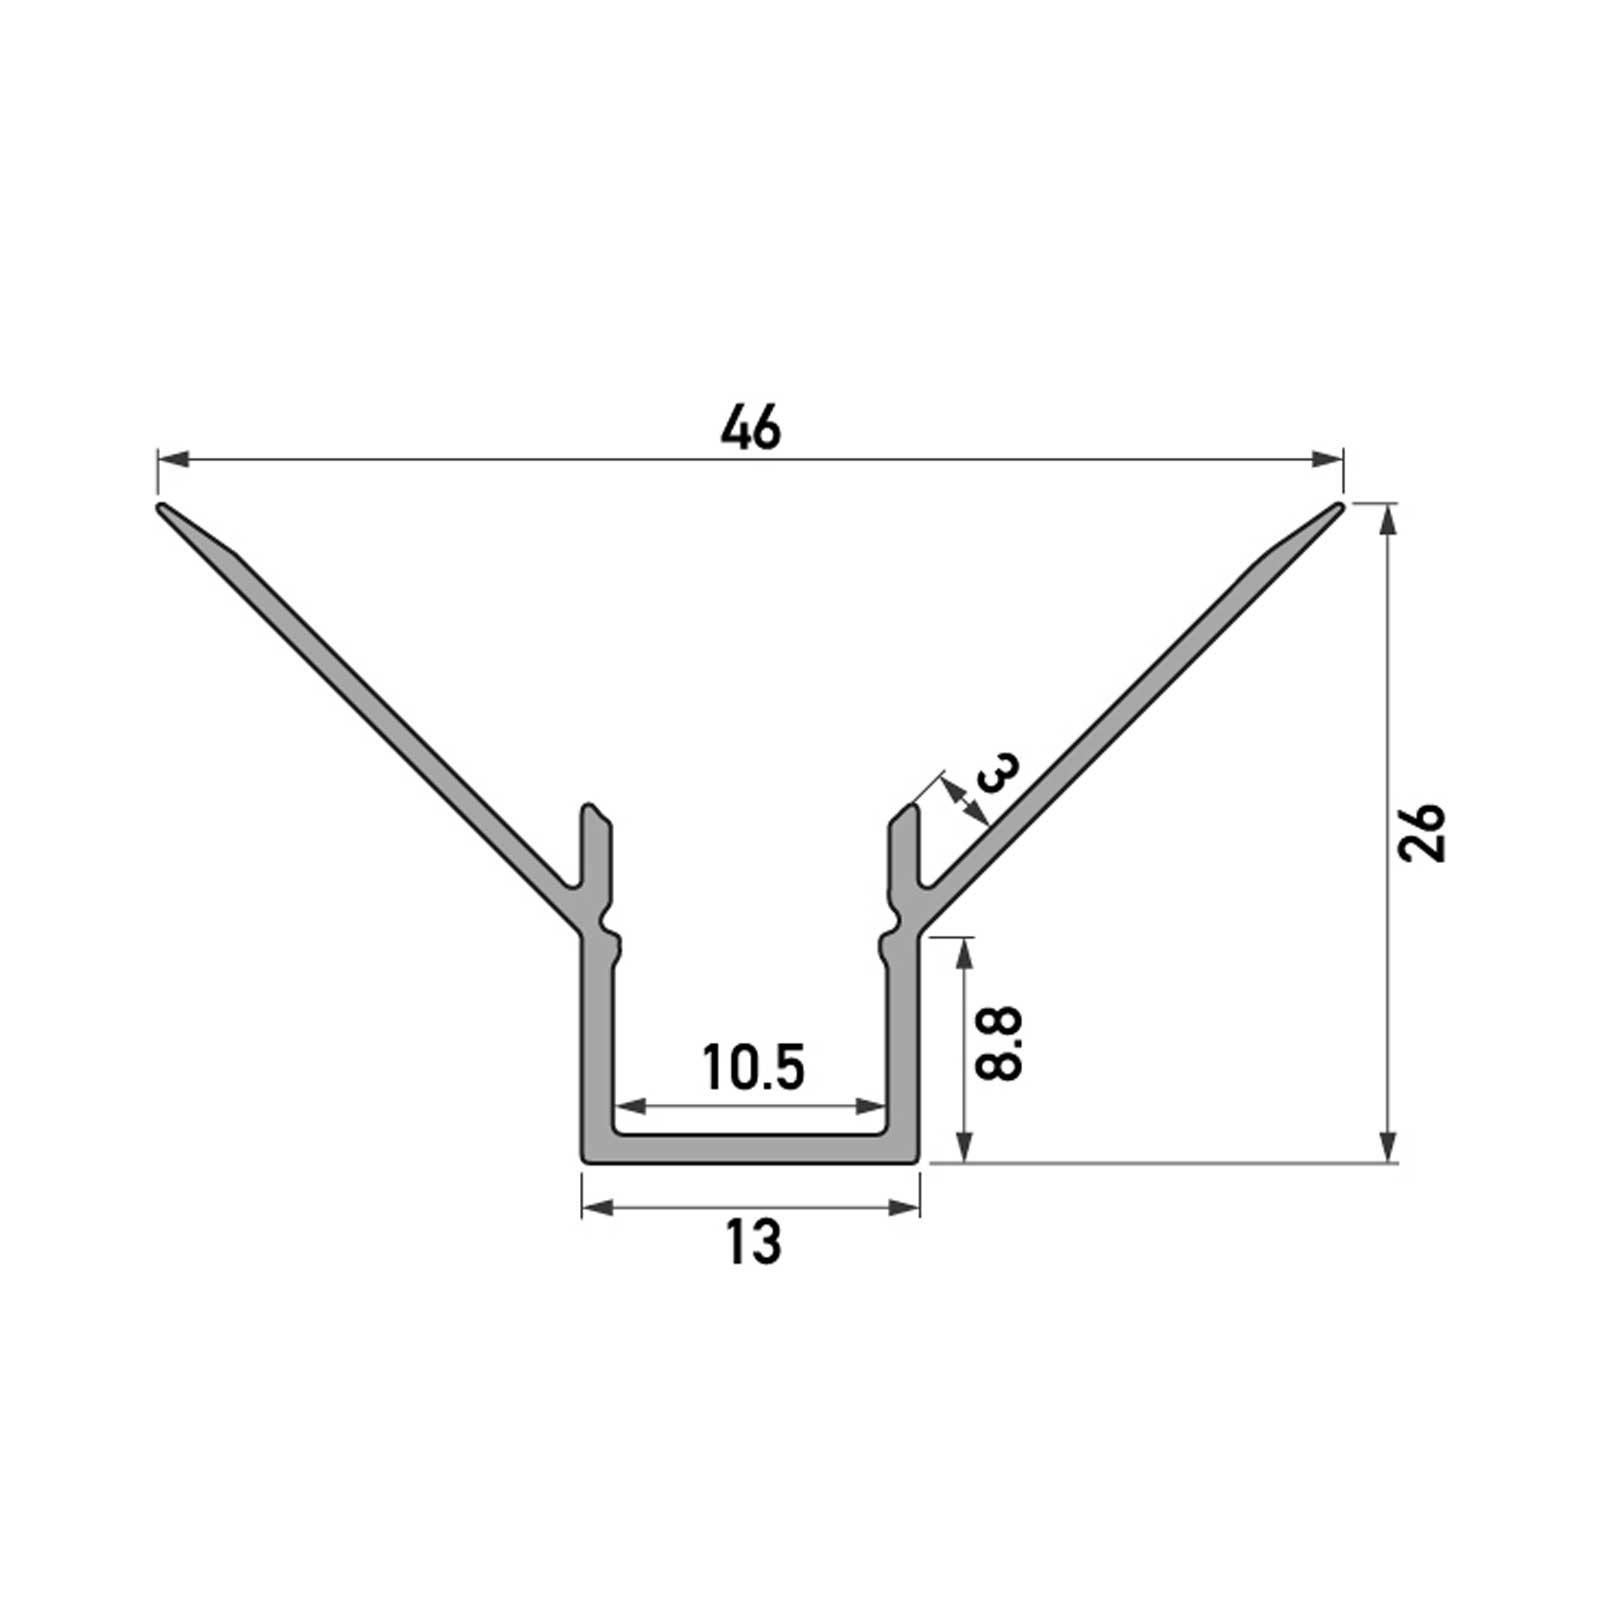 Skizze 2 Meter LED Inneneck-Aluprofil ONUR (ON) für Trockenbau Rigipswand